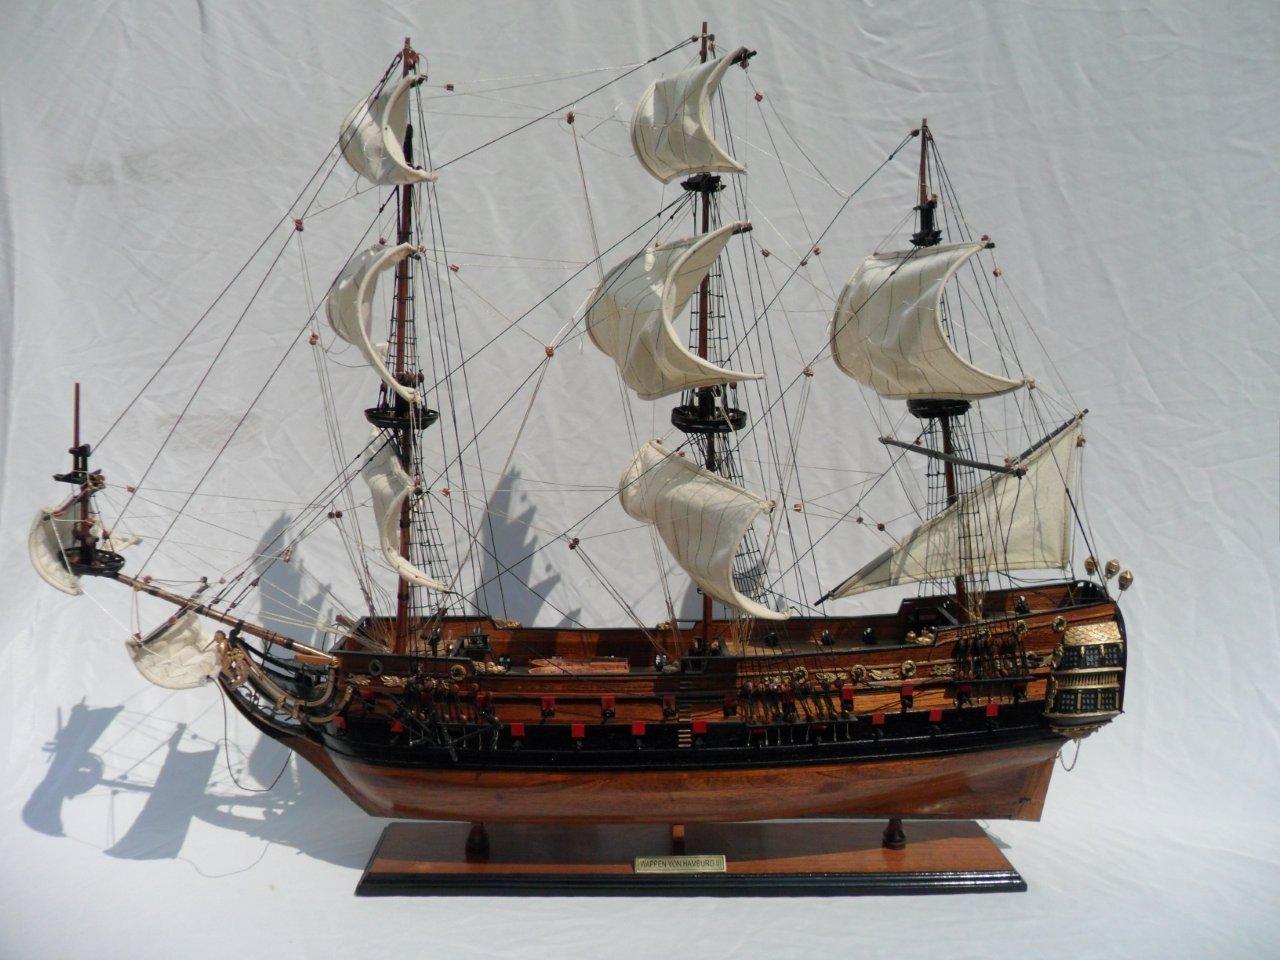 1996-12604-Wapen-von-Hamburg-III-Model-ship